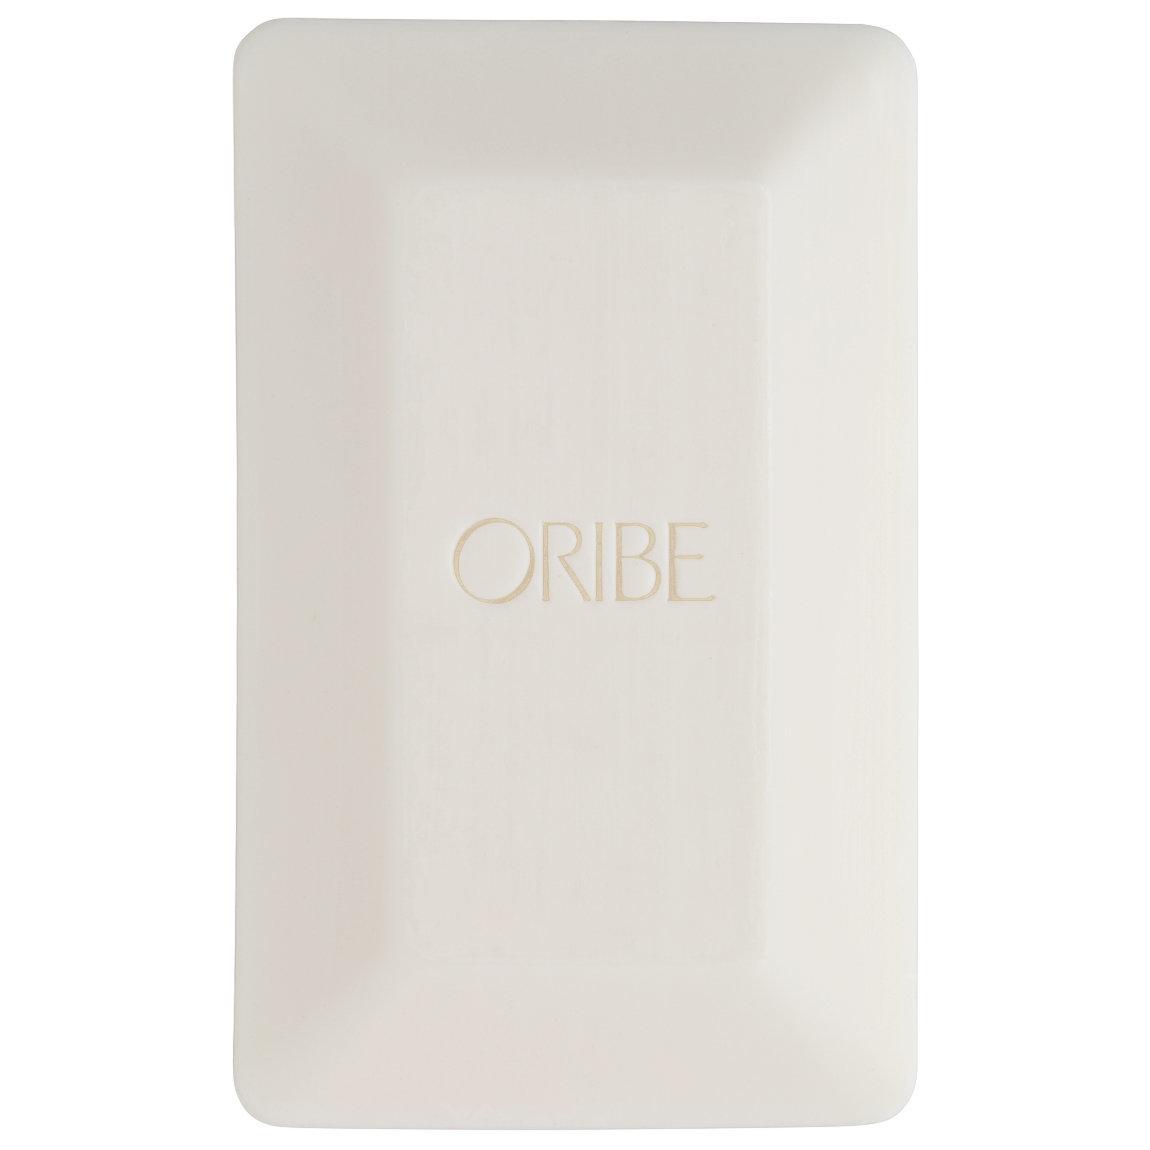 Oribe Cote d'Azur Bar Soap product swatch.